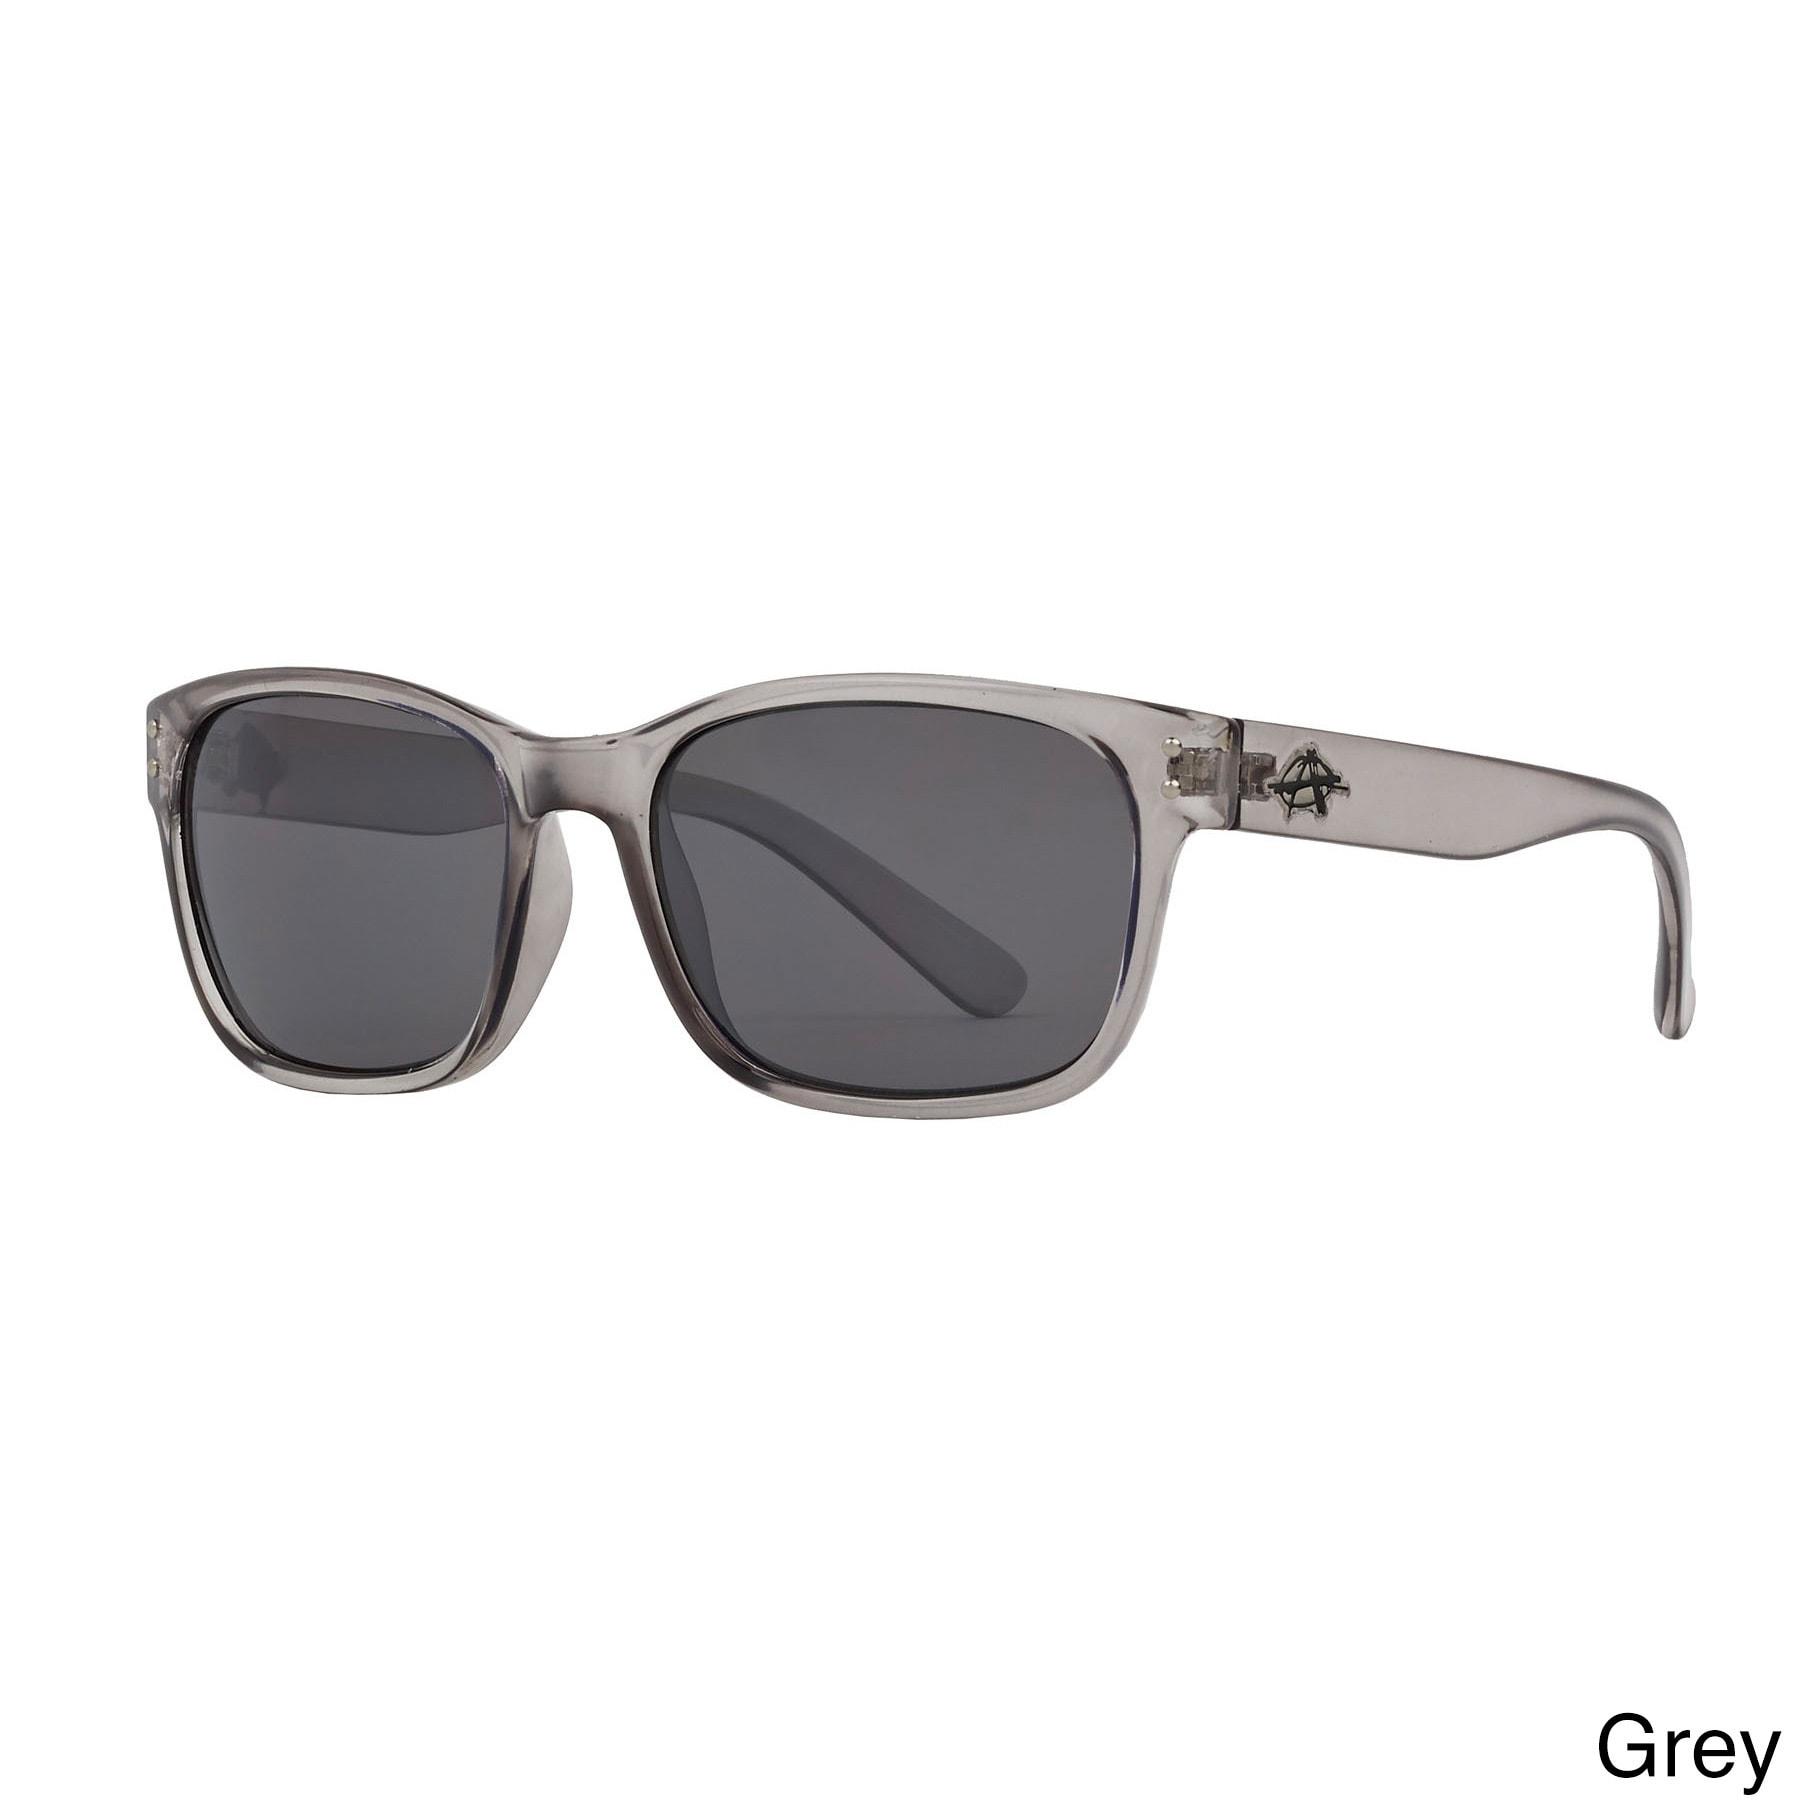 7ce5e6e73298a Shop Anarchy Unisex  Vert  Polarized Sunglasses - Free Shipping On ...